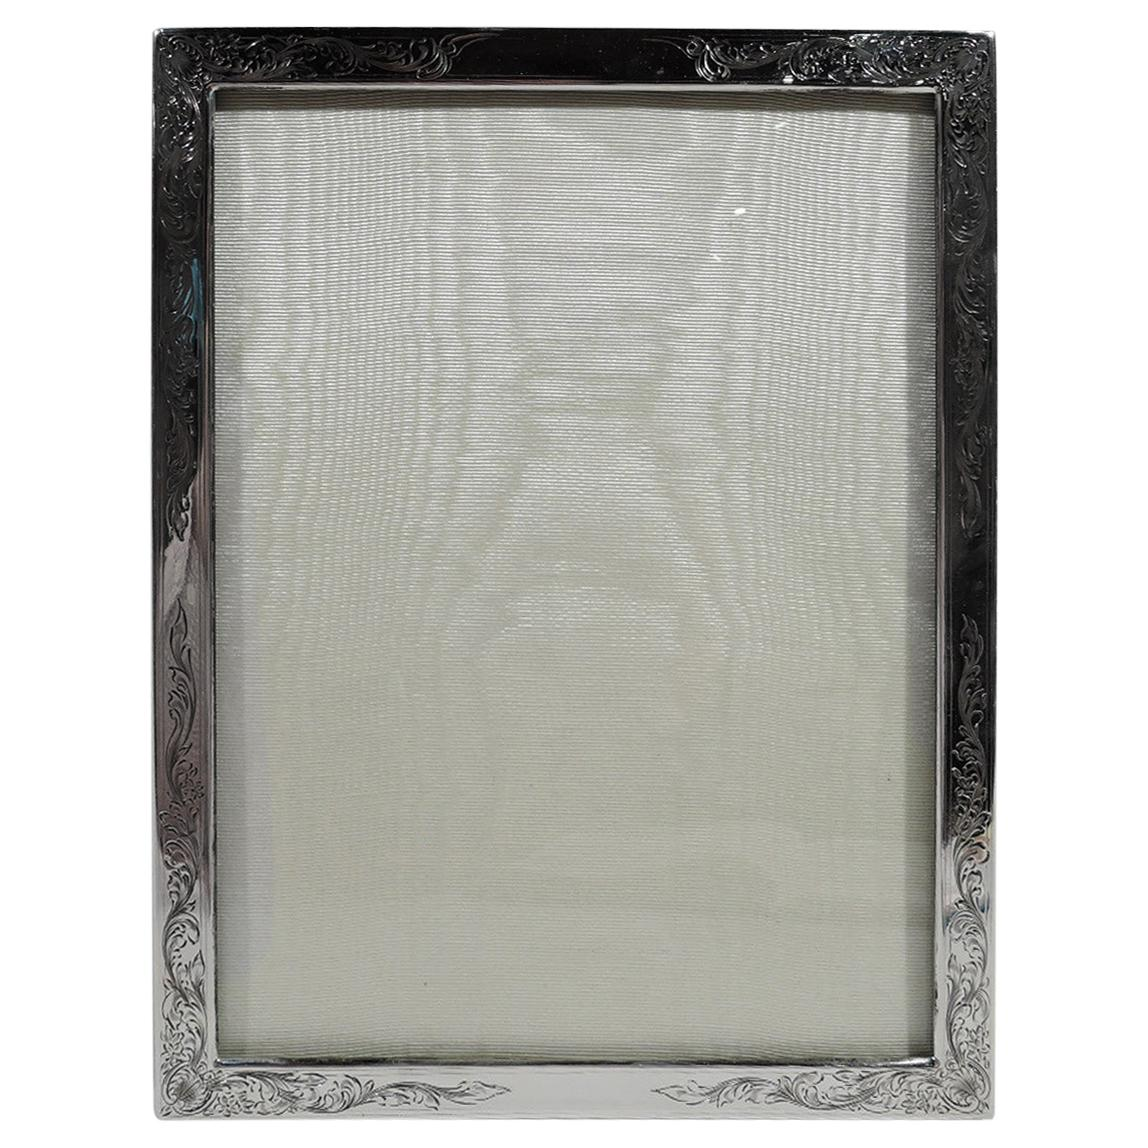 Antique American Edwardian Art Nouveau Sterling Silver Picture Frame